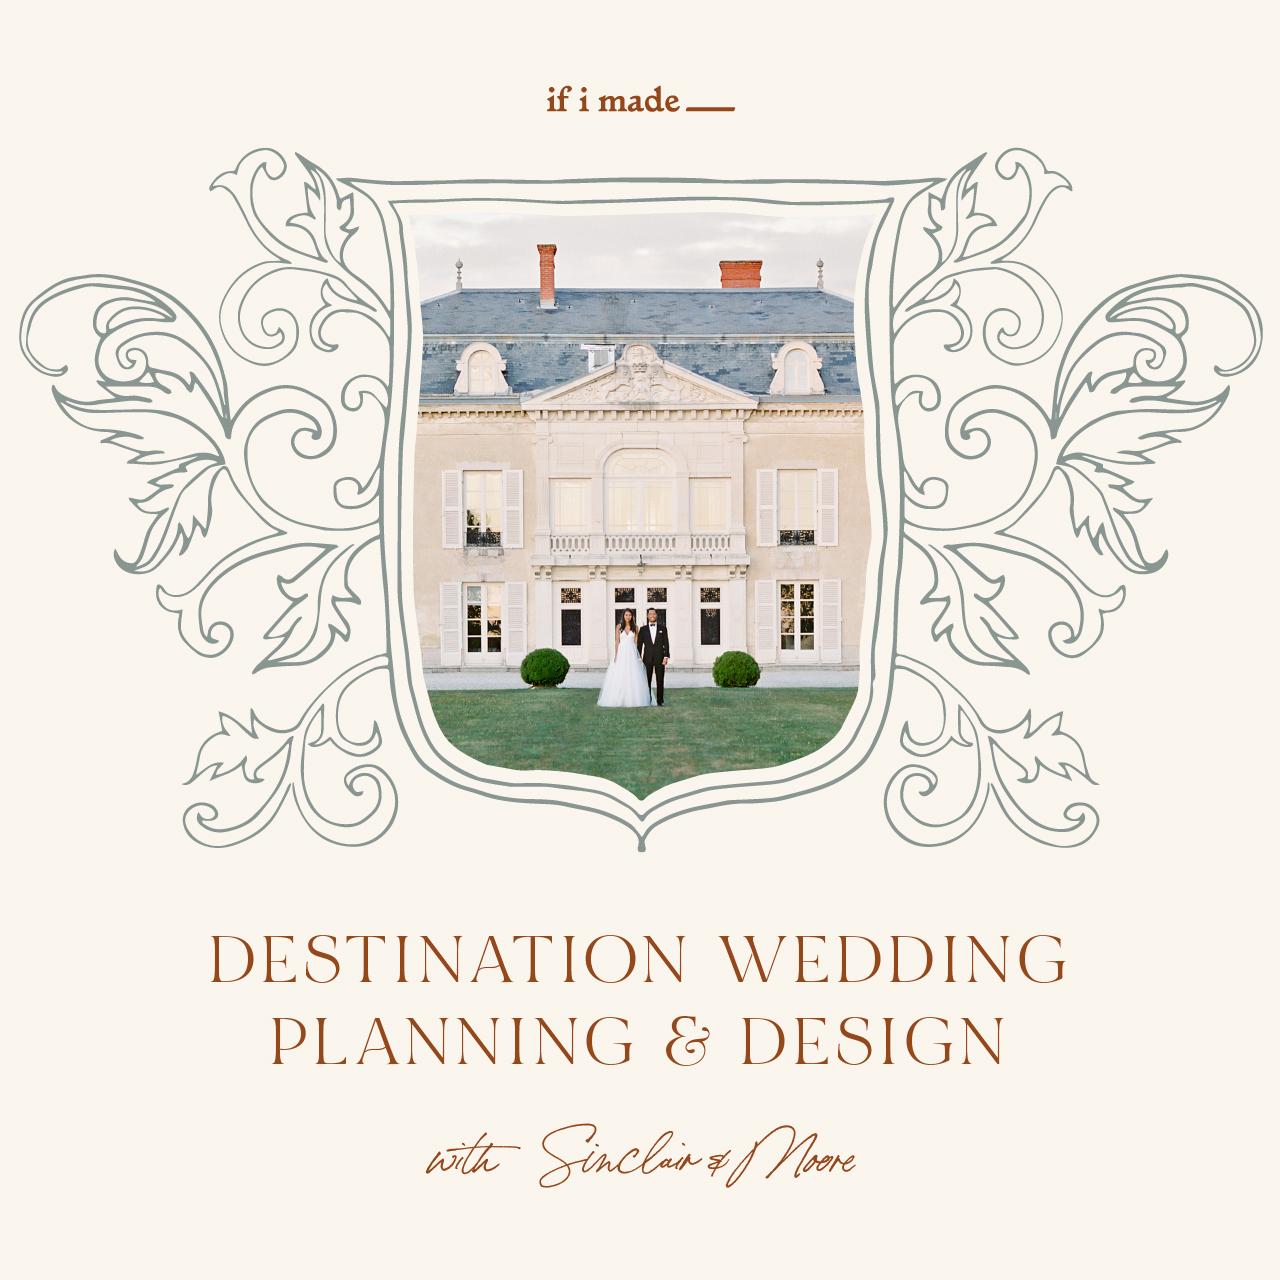 Destination Wedding Planning & Design with Sinclair & Moore